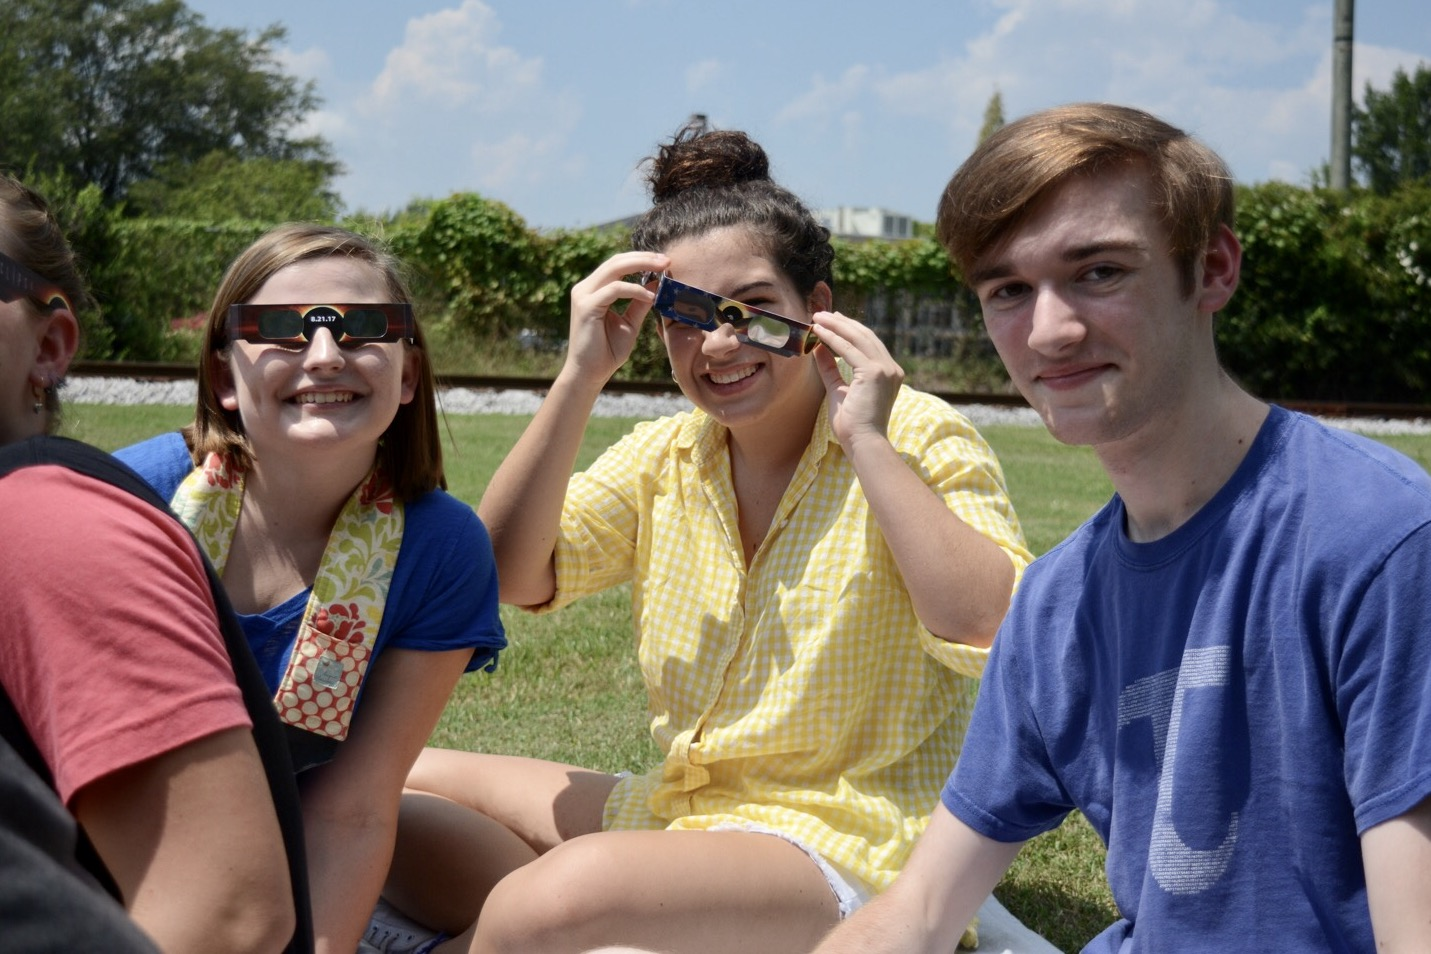 Anna+Katherine+Overstreet%2C+Mackenzie+Umanzor%2C+and+Keegan+Lindsay+sit+on+blanket+while+watching+the+eclipse.+